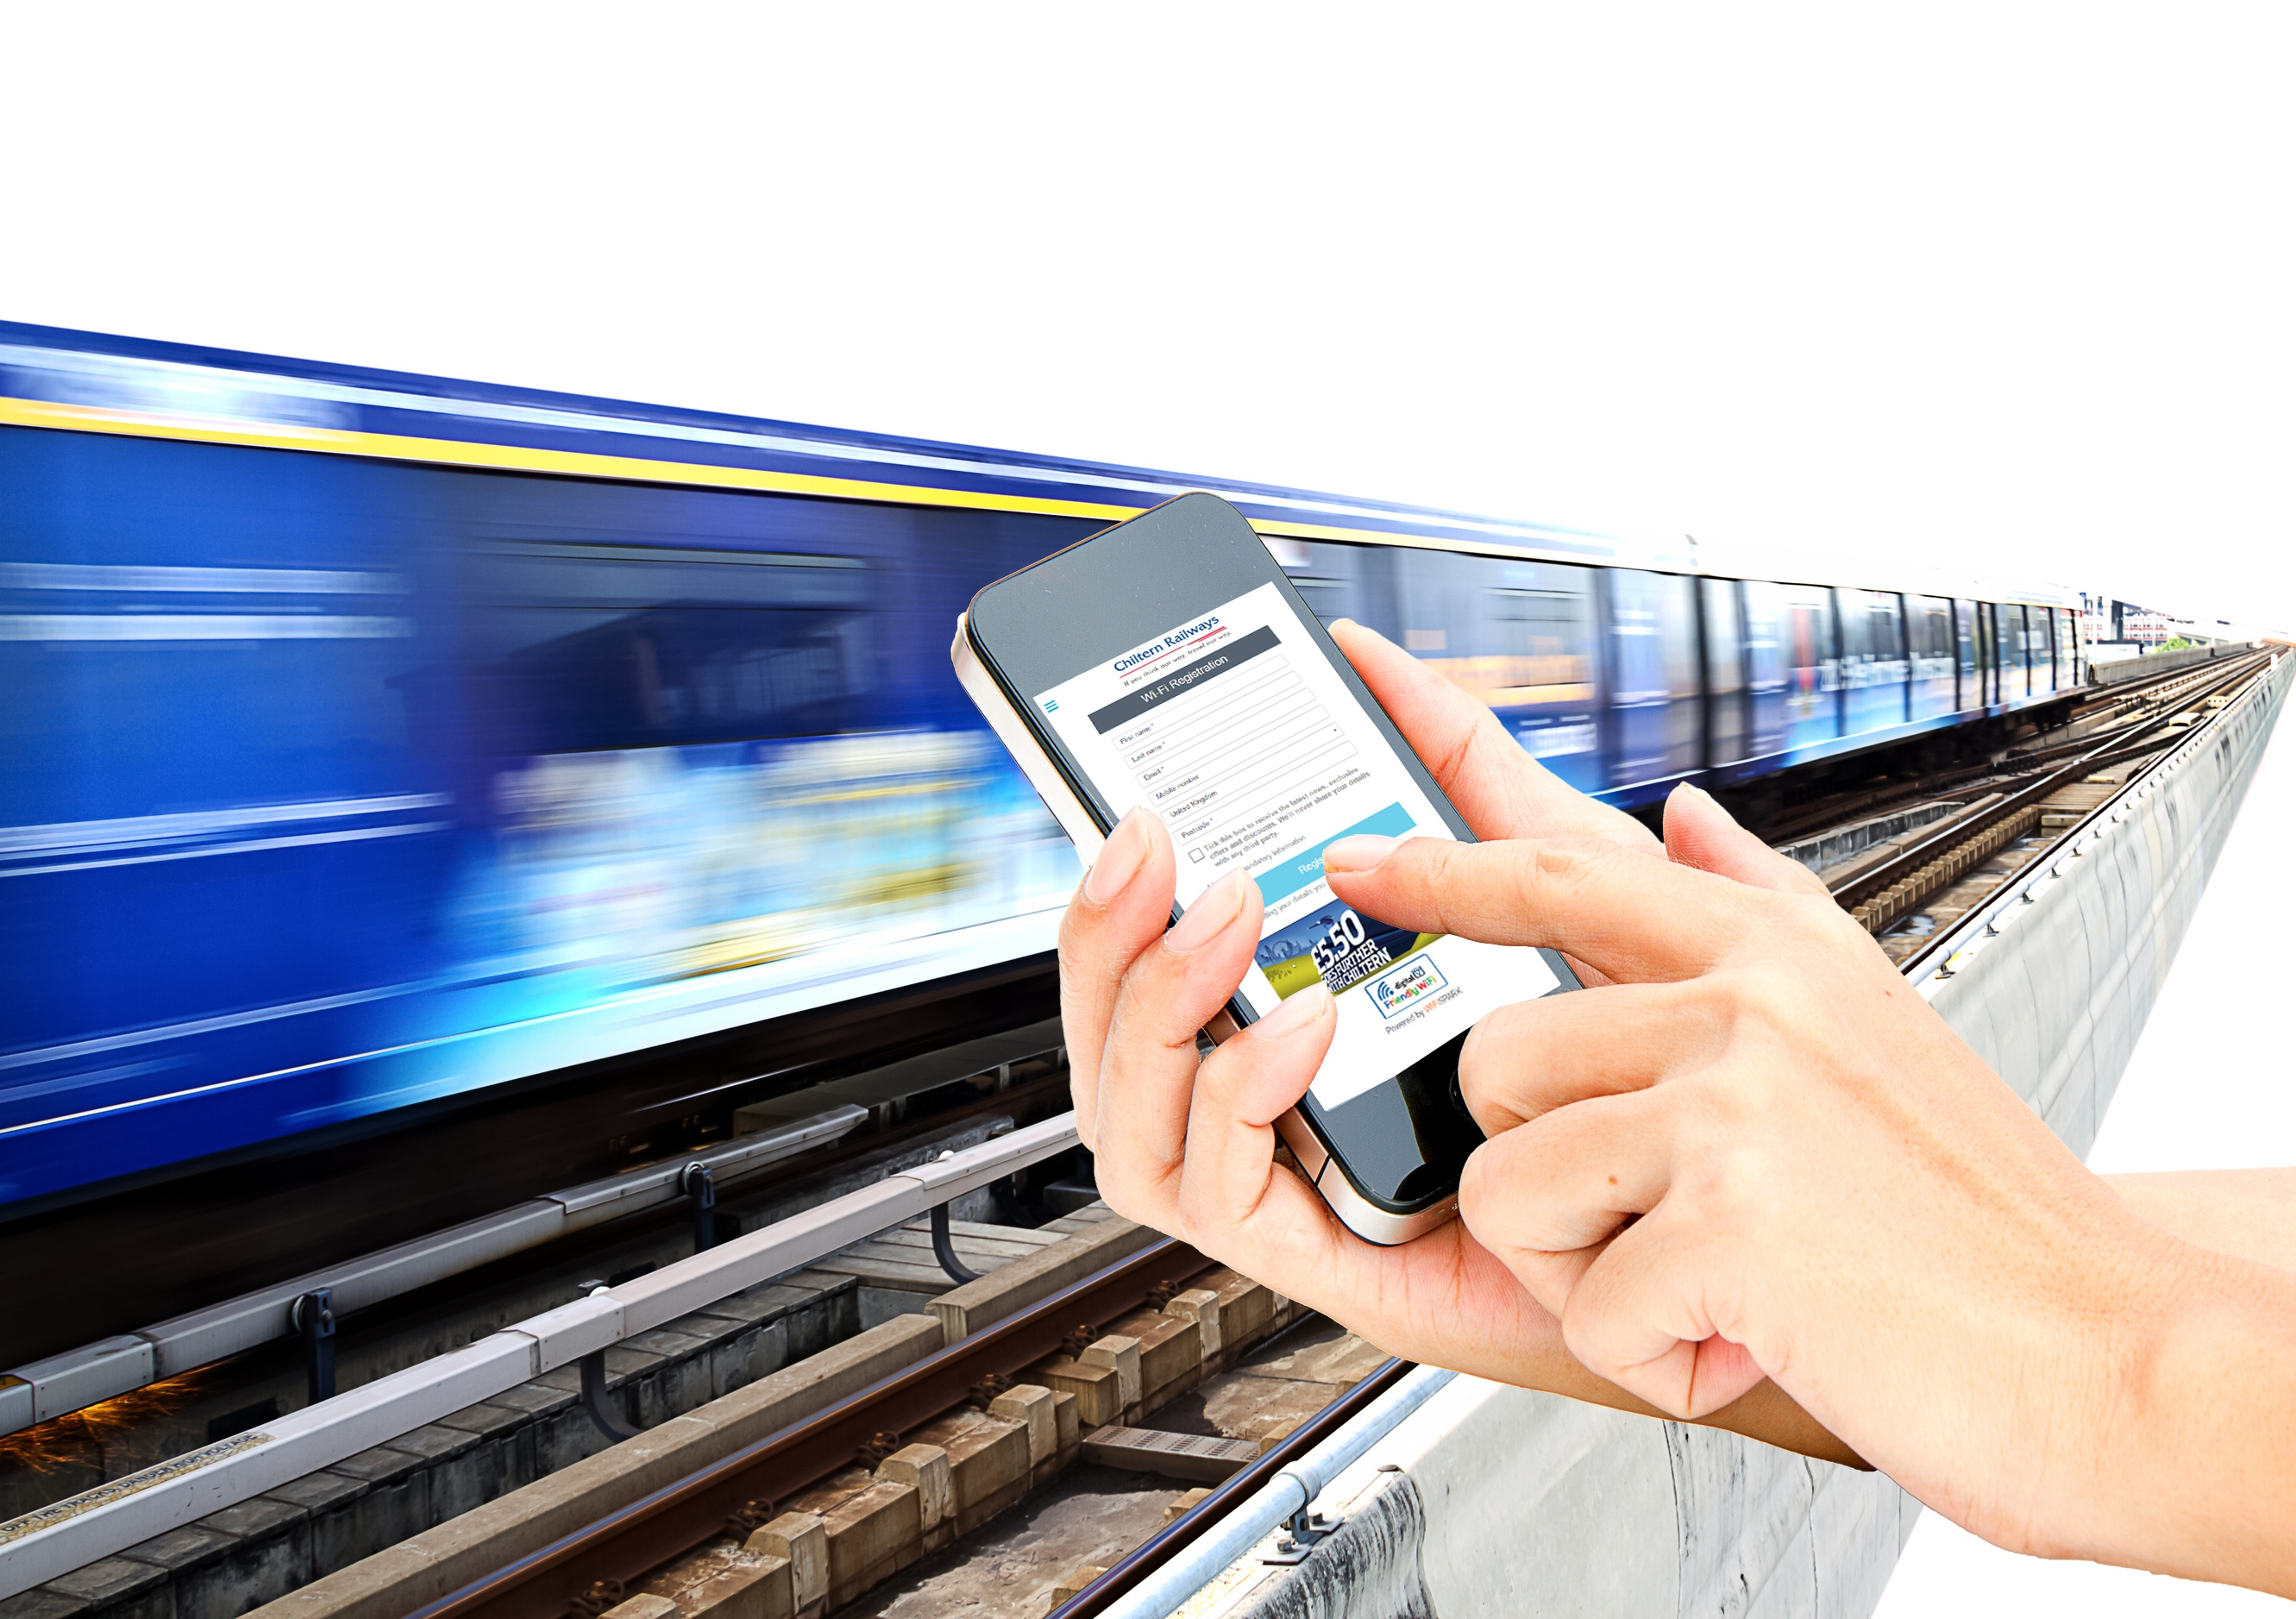 WiFi_SPARK_Rail_Image